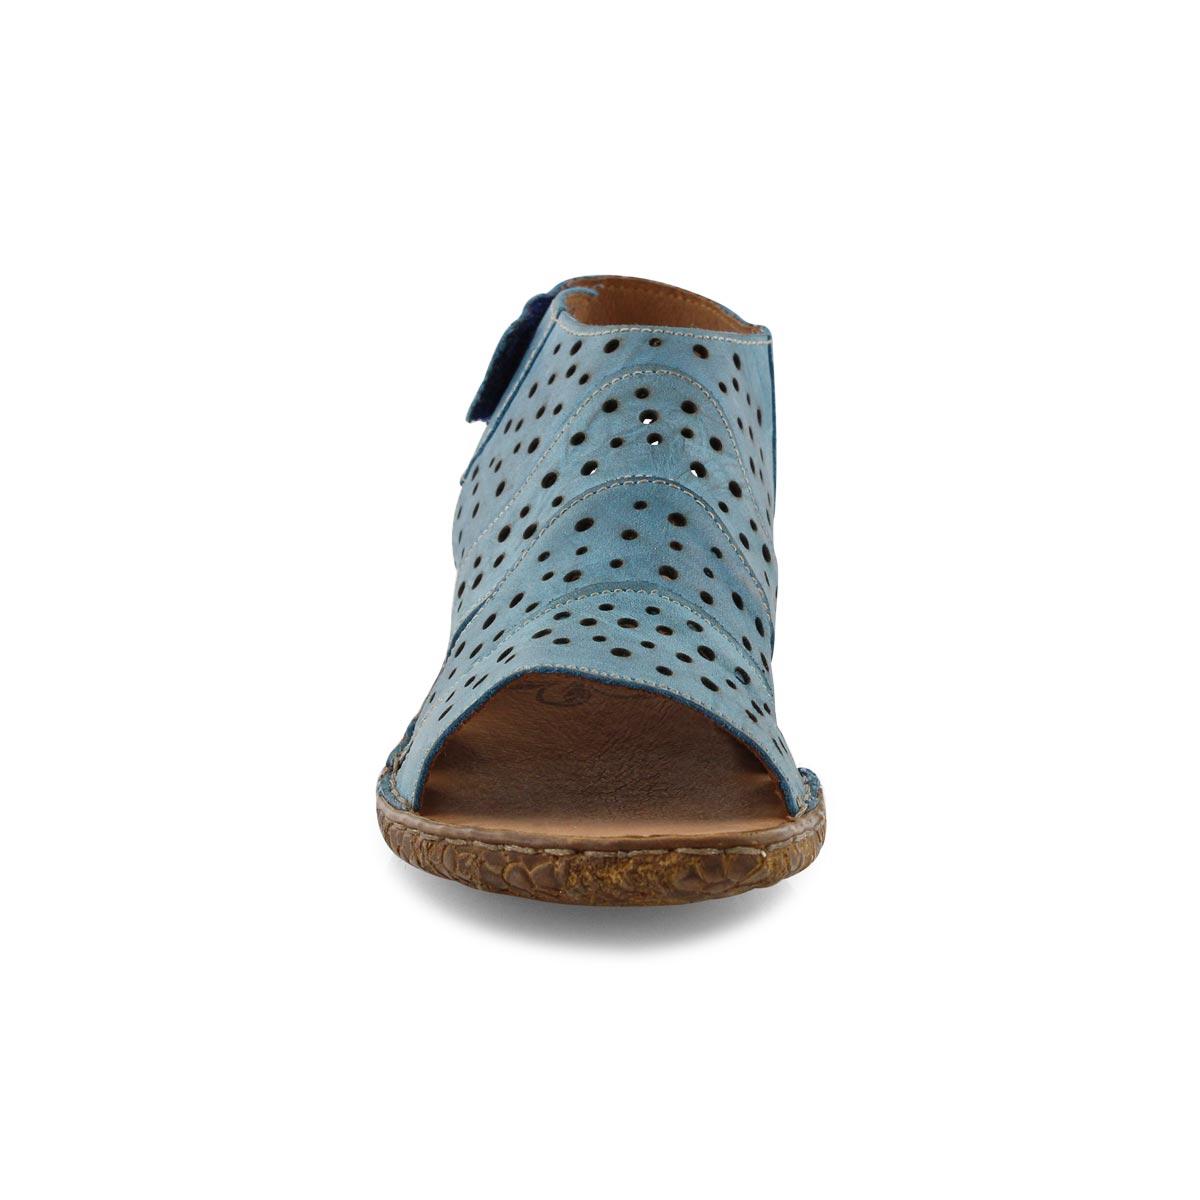 Lds Rosalie 31 azure casual sandal